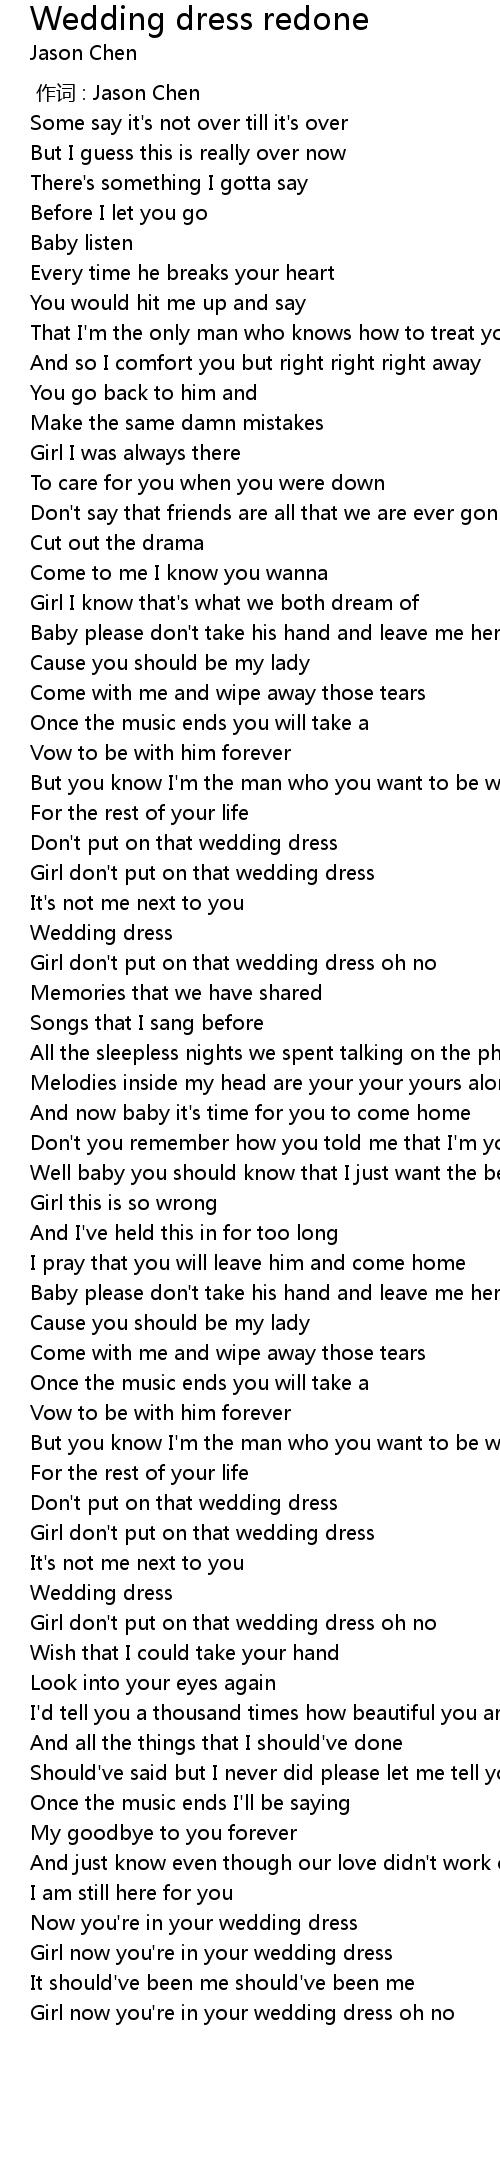 Wedding Dress Redone Lyrics Follow Lyrics